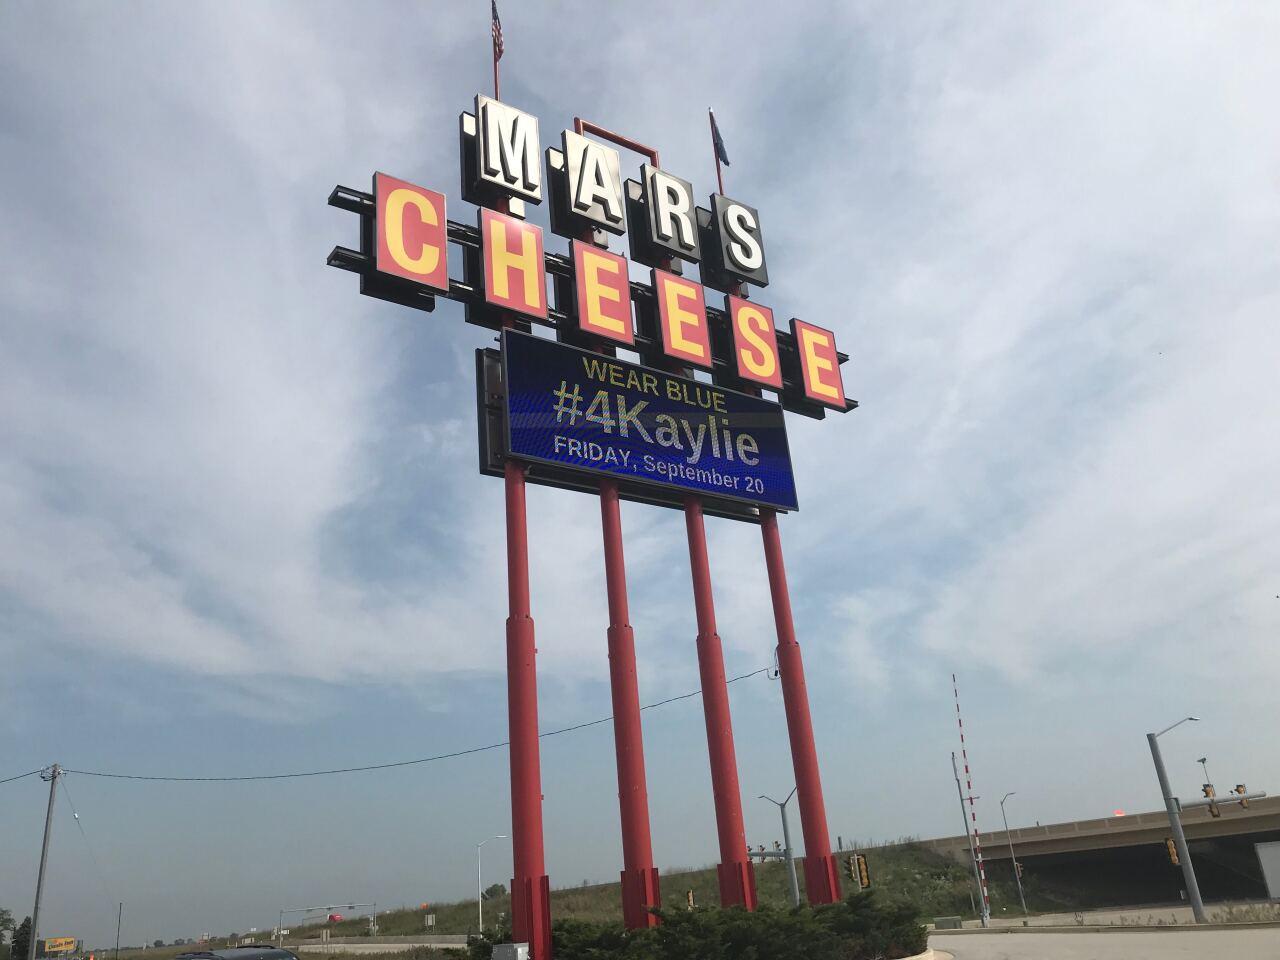 Mars Cheese Castle honors Kaylie Juga